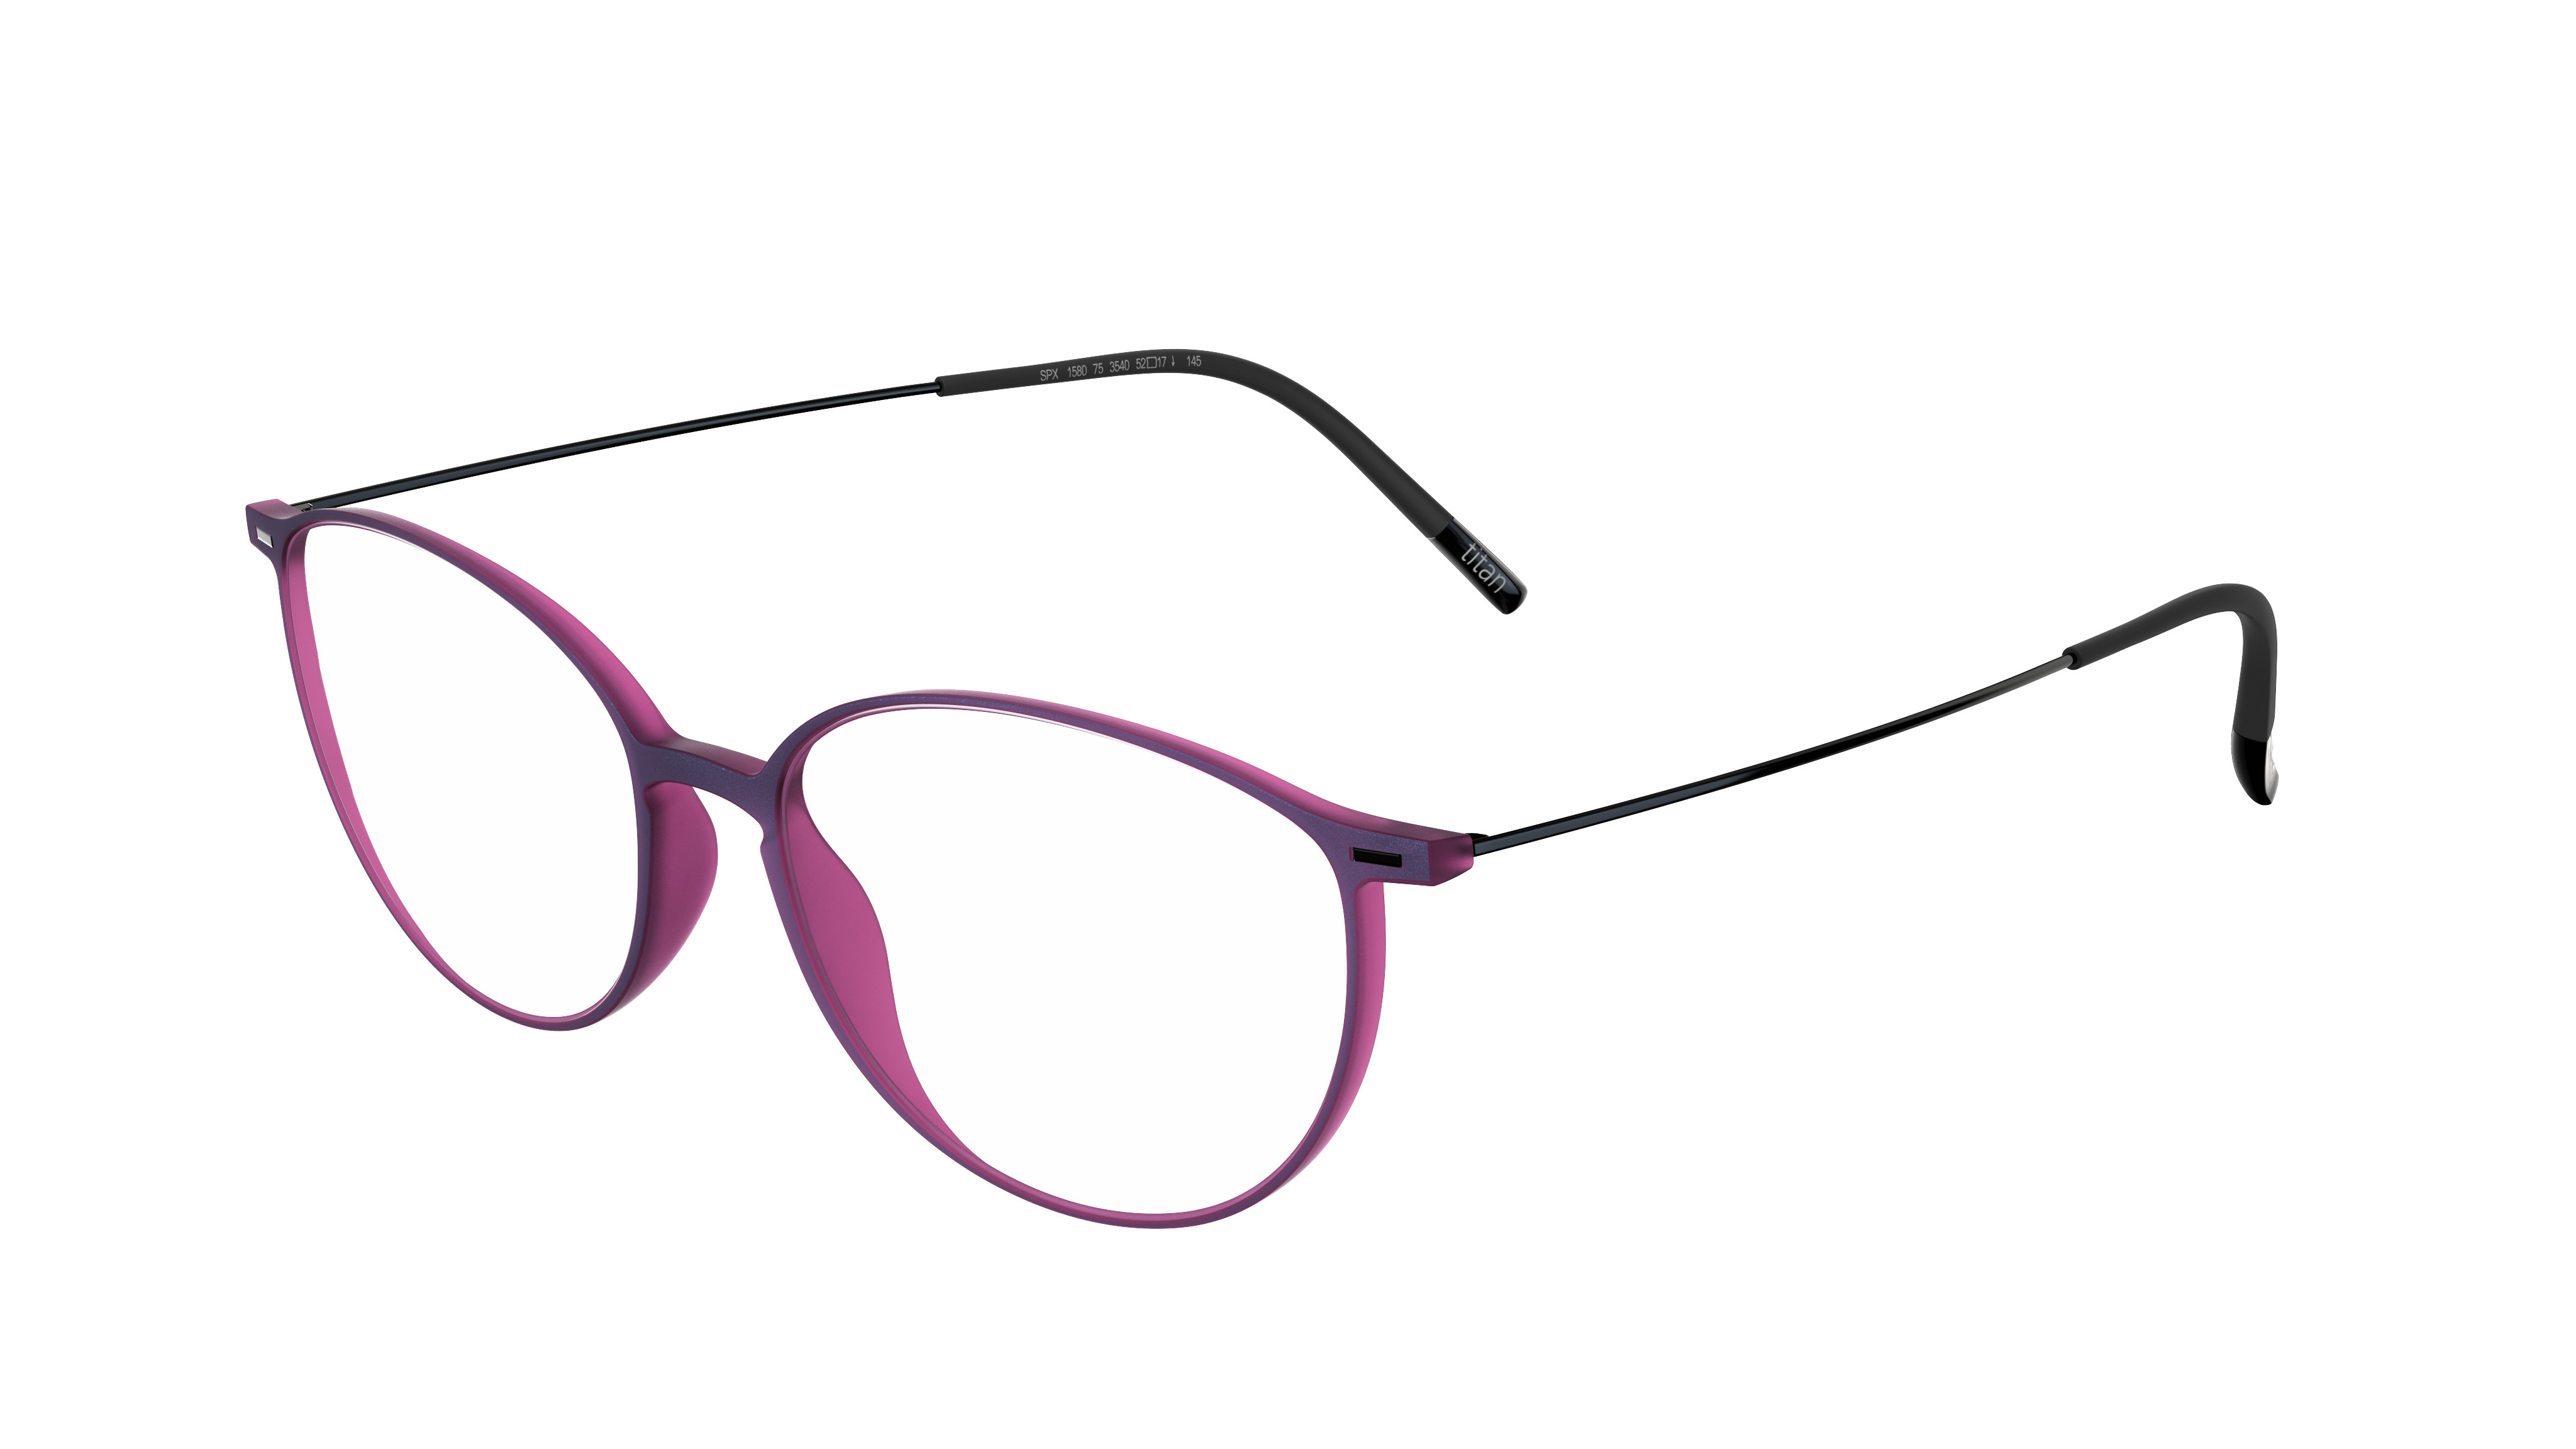 7c73852acef94c Silhouette Urban NEO Full Rim 2908 Eyeglasses (Chassis  1580 ...